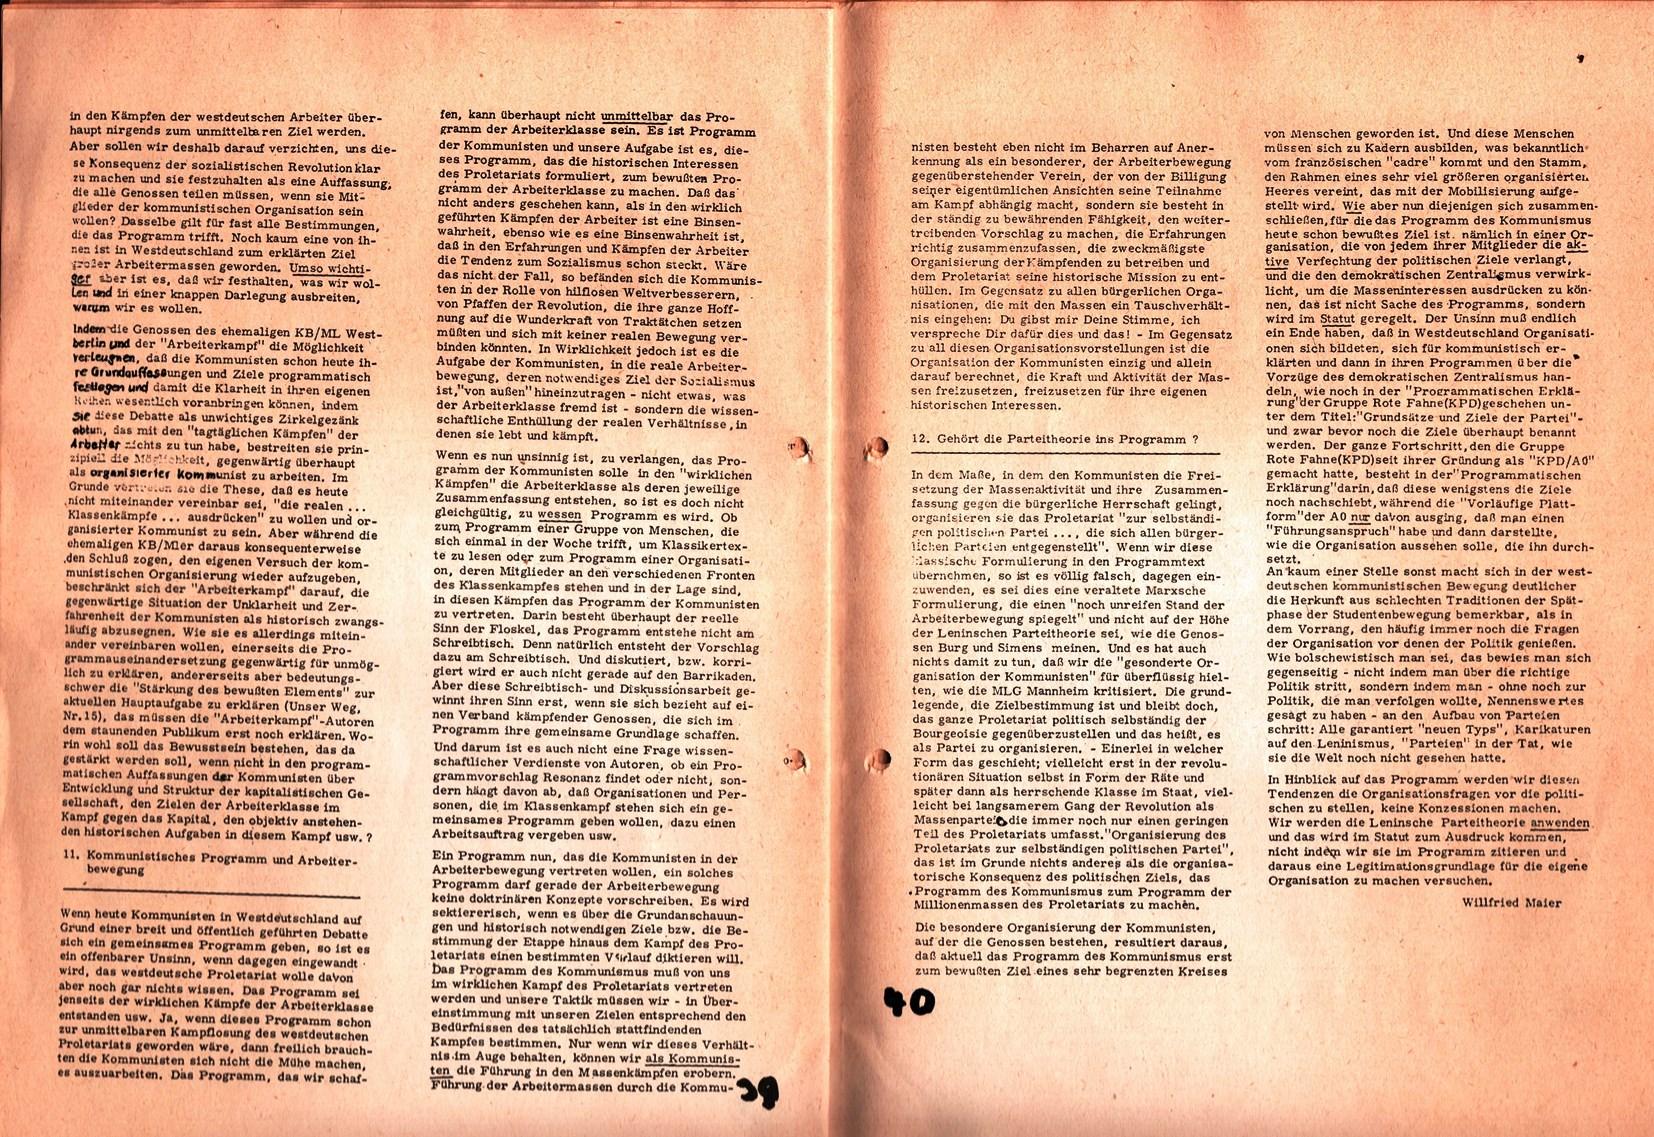 KSV_1974_Materialien_zur_Programmdiskussion_01_021